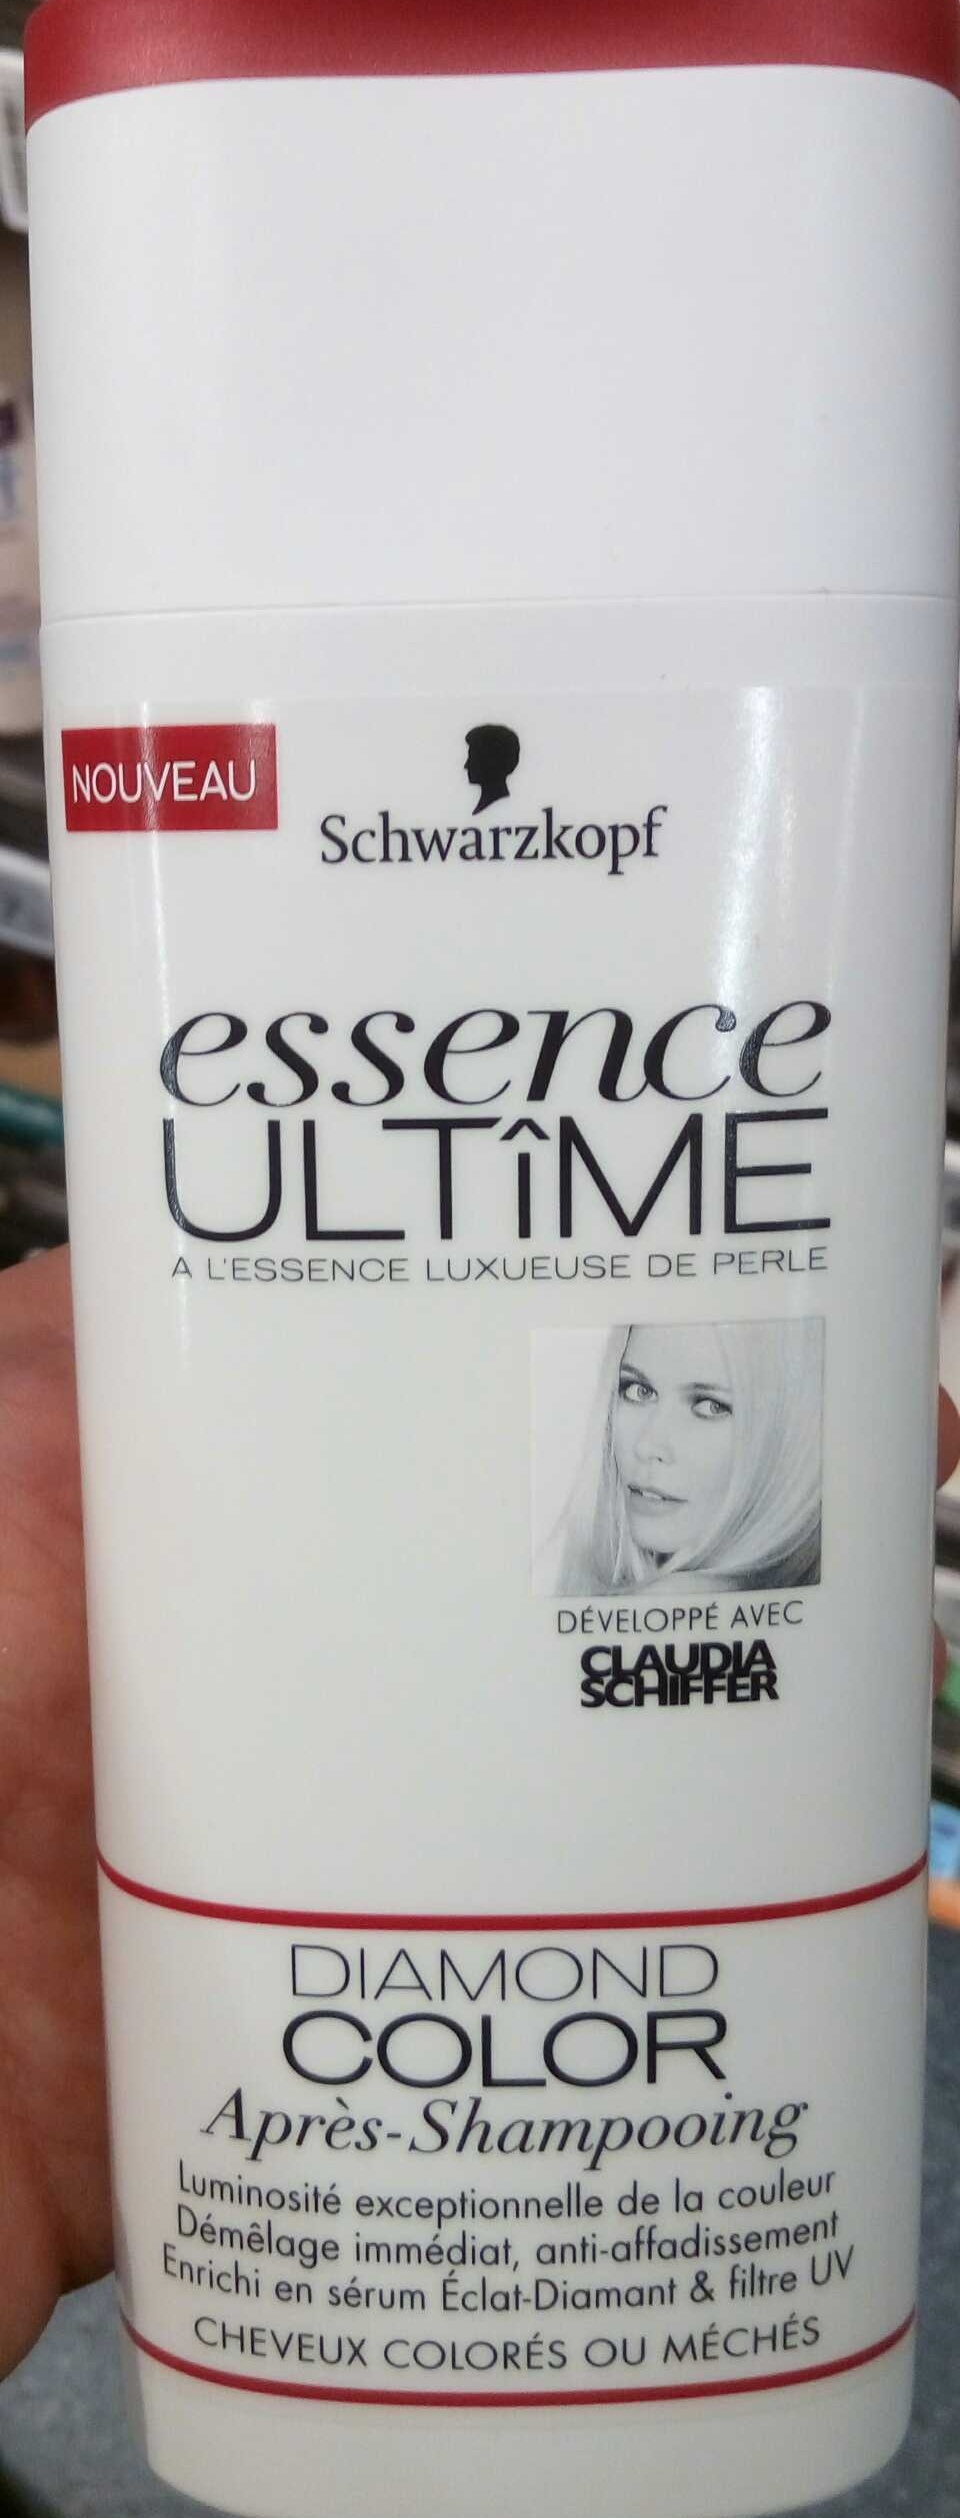 Essence Ultîme Diamond Color Après-Shampooing - Produit